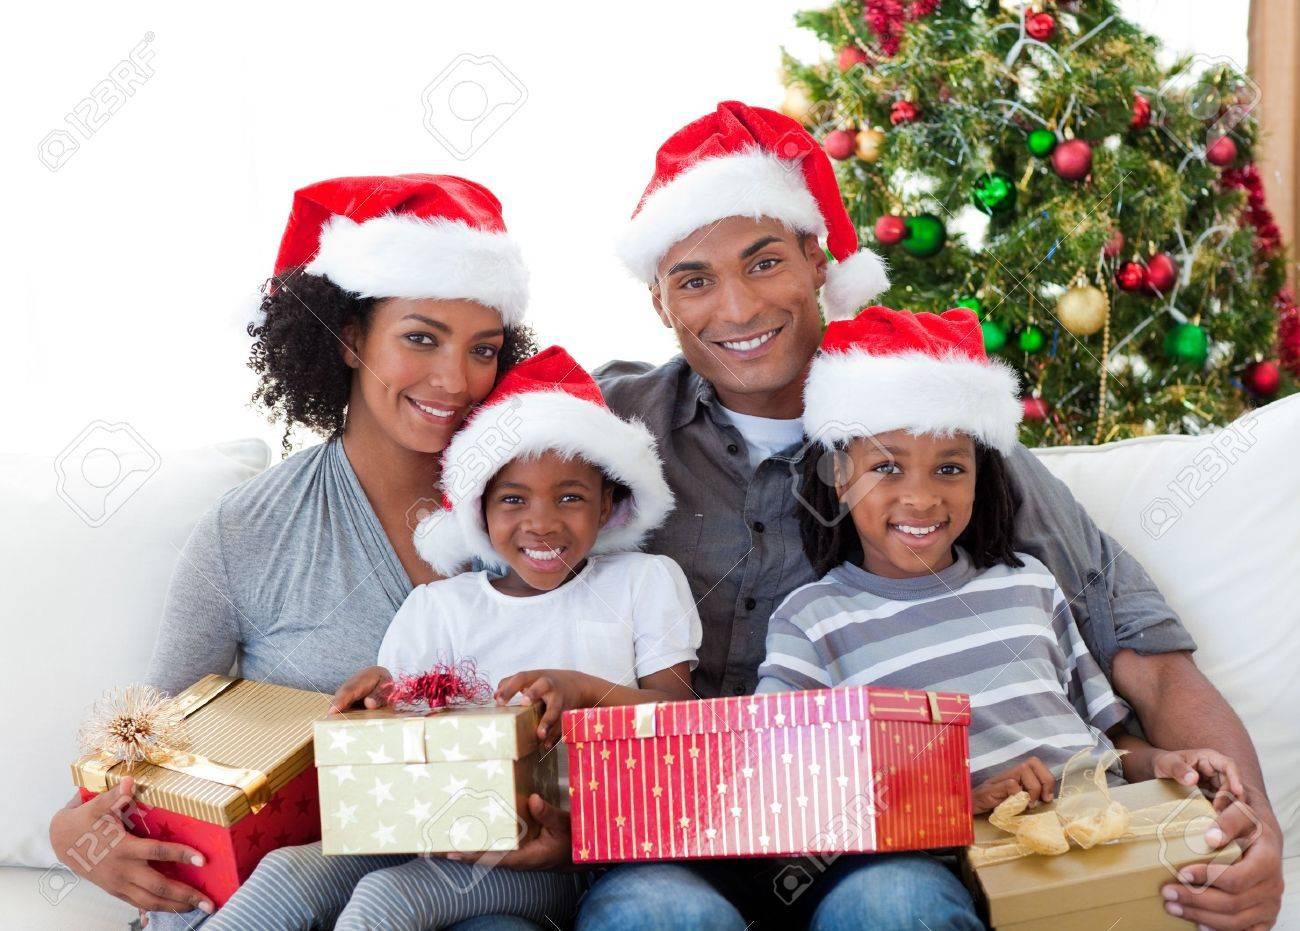 Family Christmas Photo Family Christmas Stock Photos Images Royalty Free Family